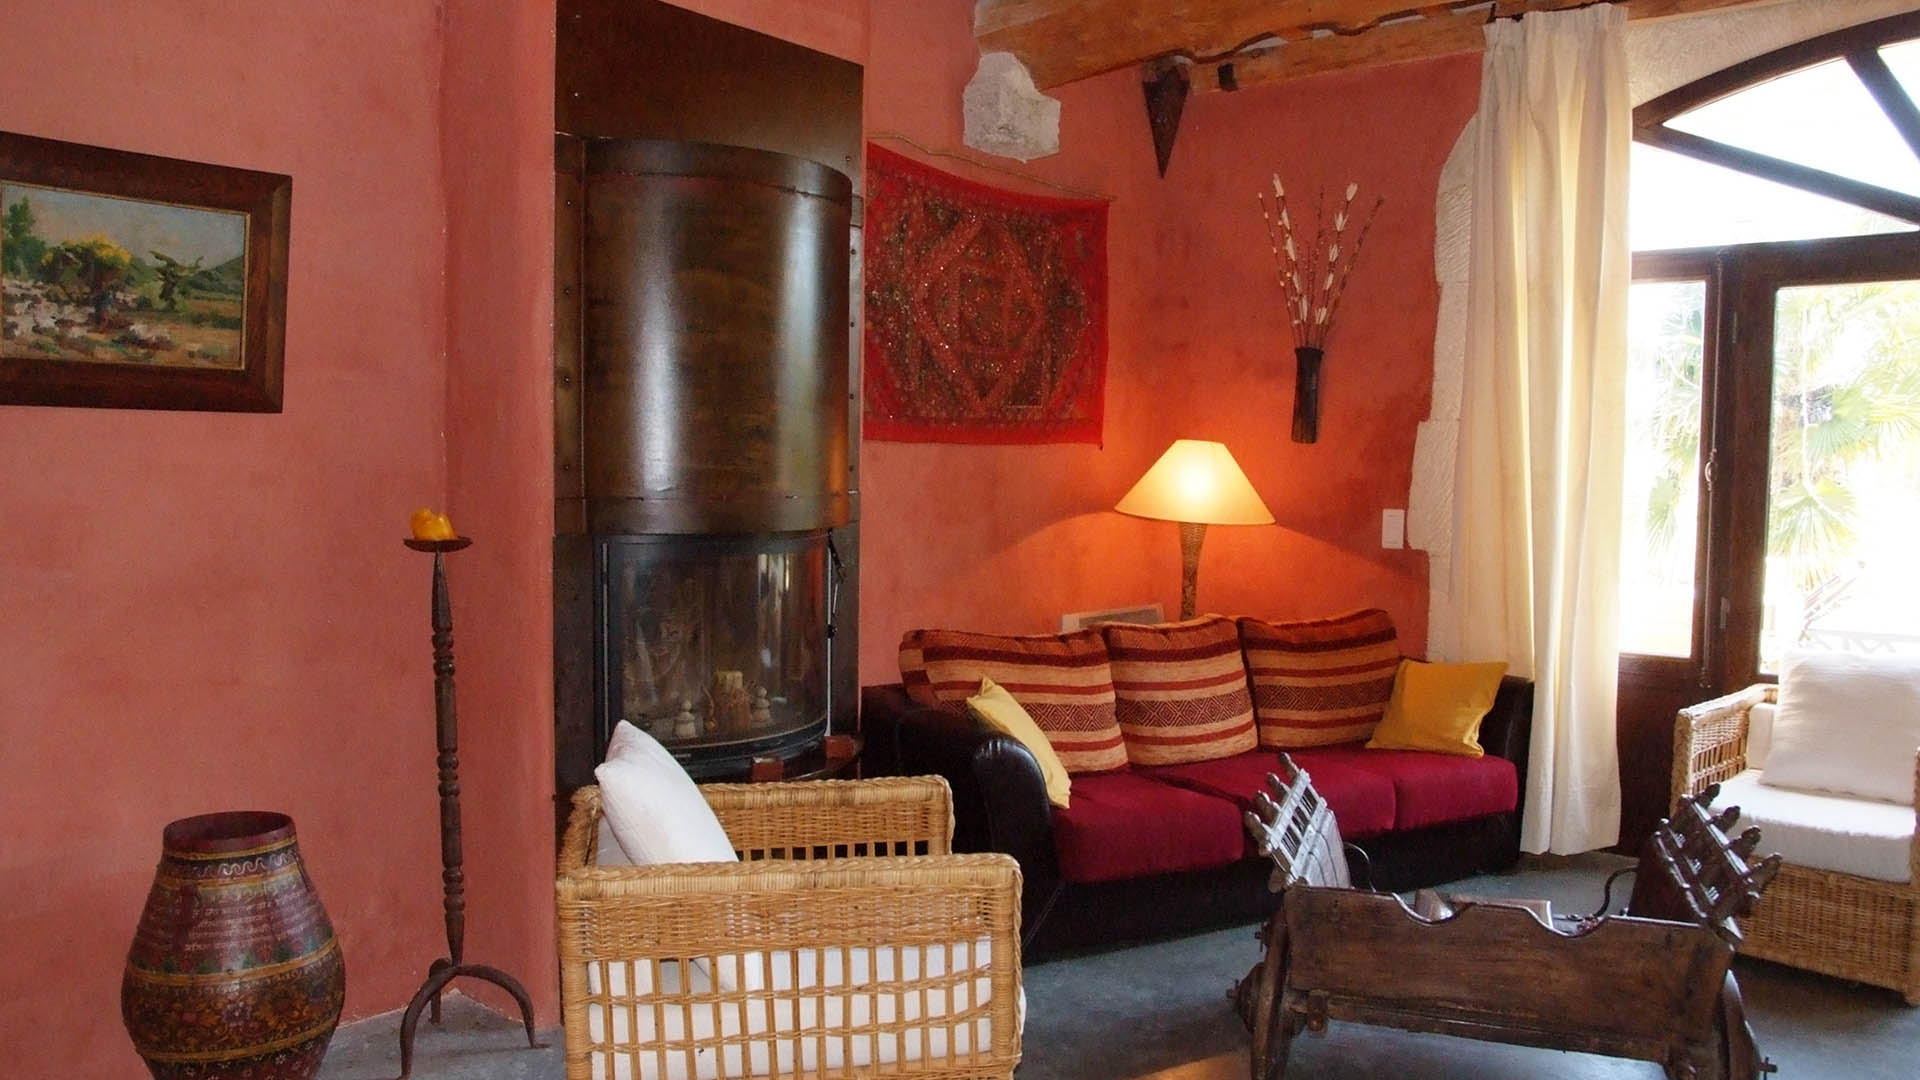 deco mas provencal trendy decoration interieur mas provencal awesome decoration interieur mas. Black Bedroom Furniture Sets. Home Design Ideas